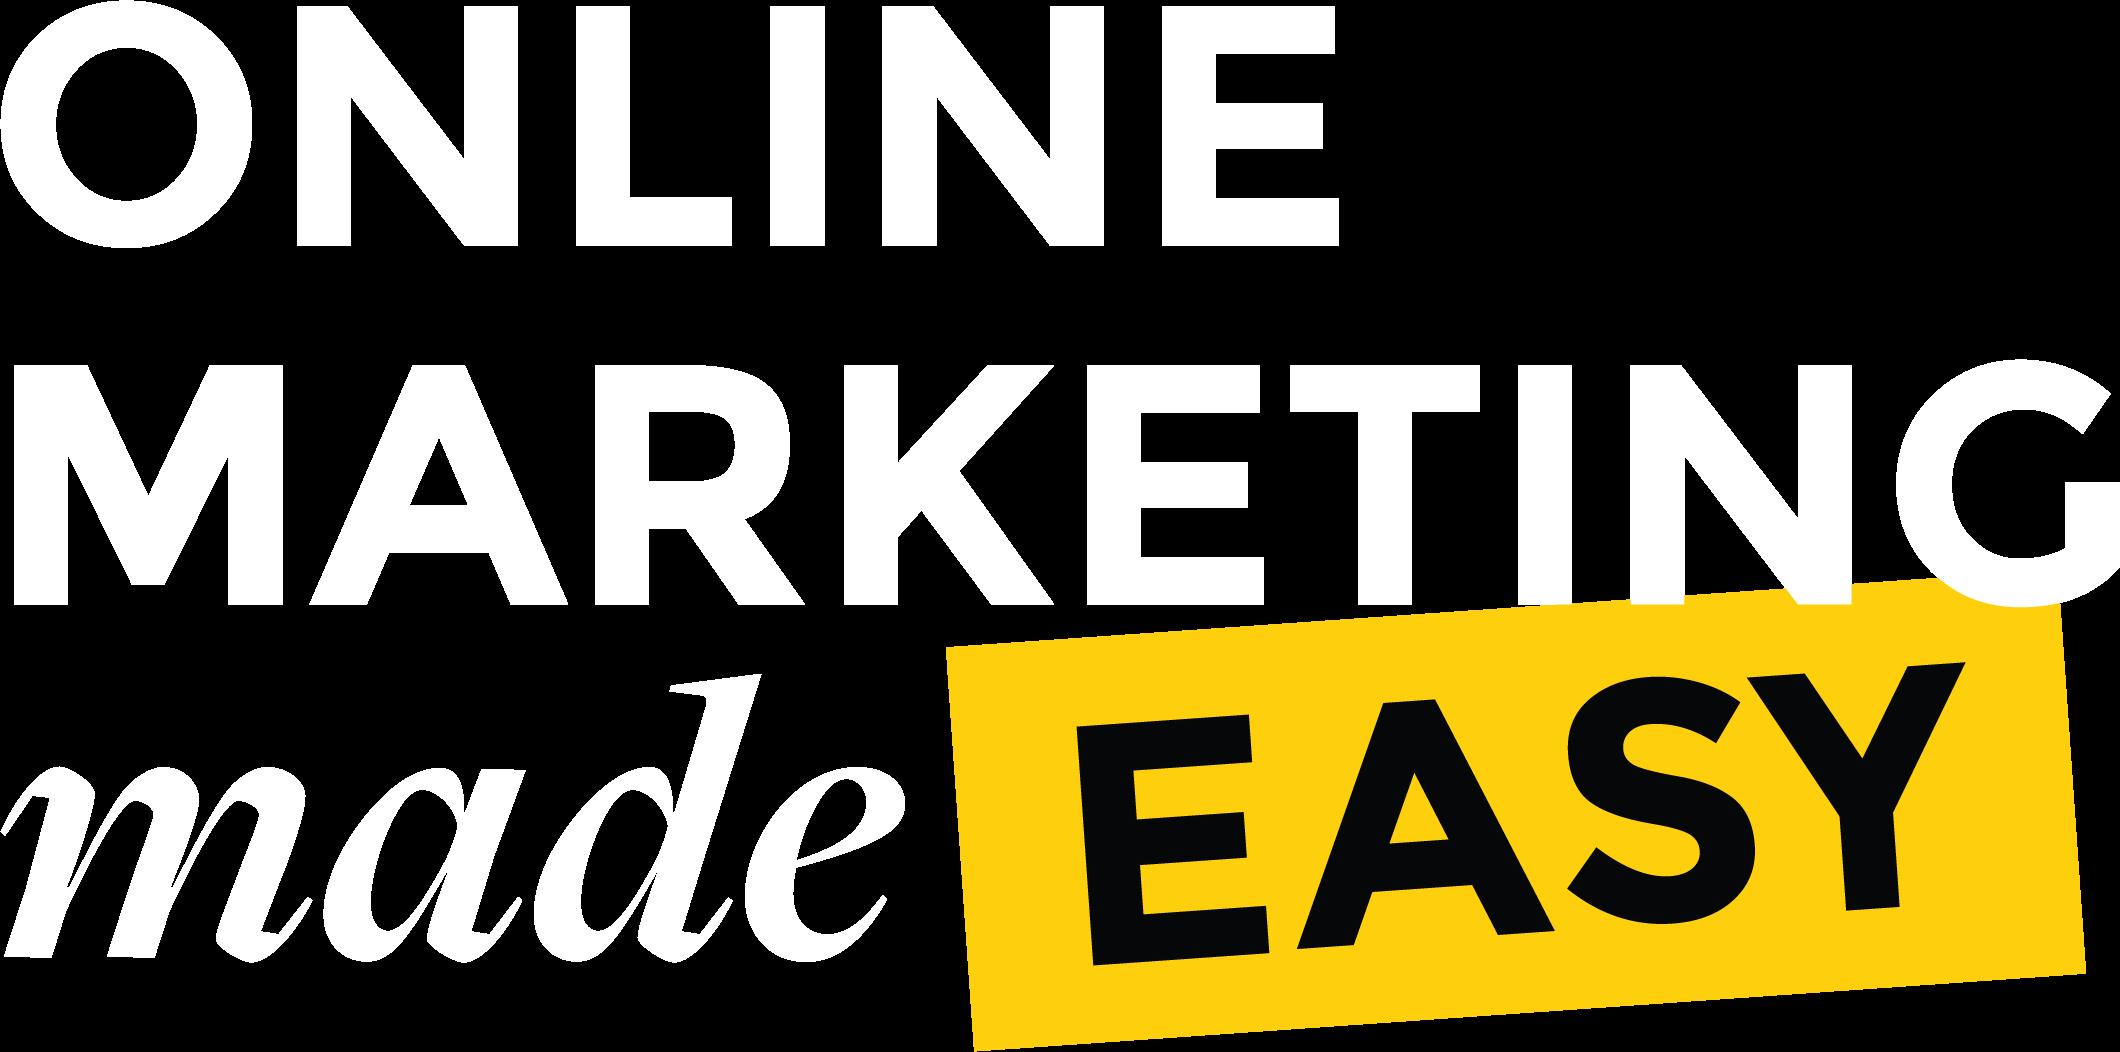 omme-logo.png